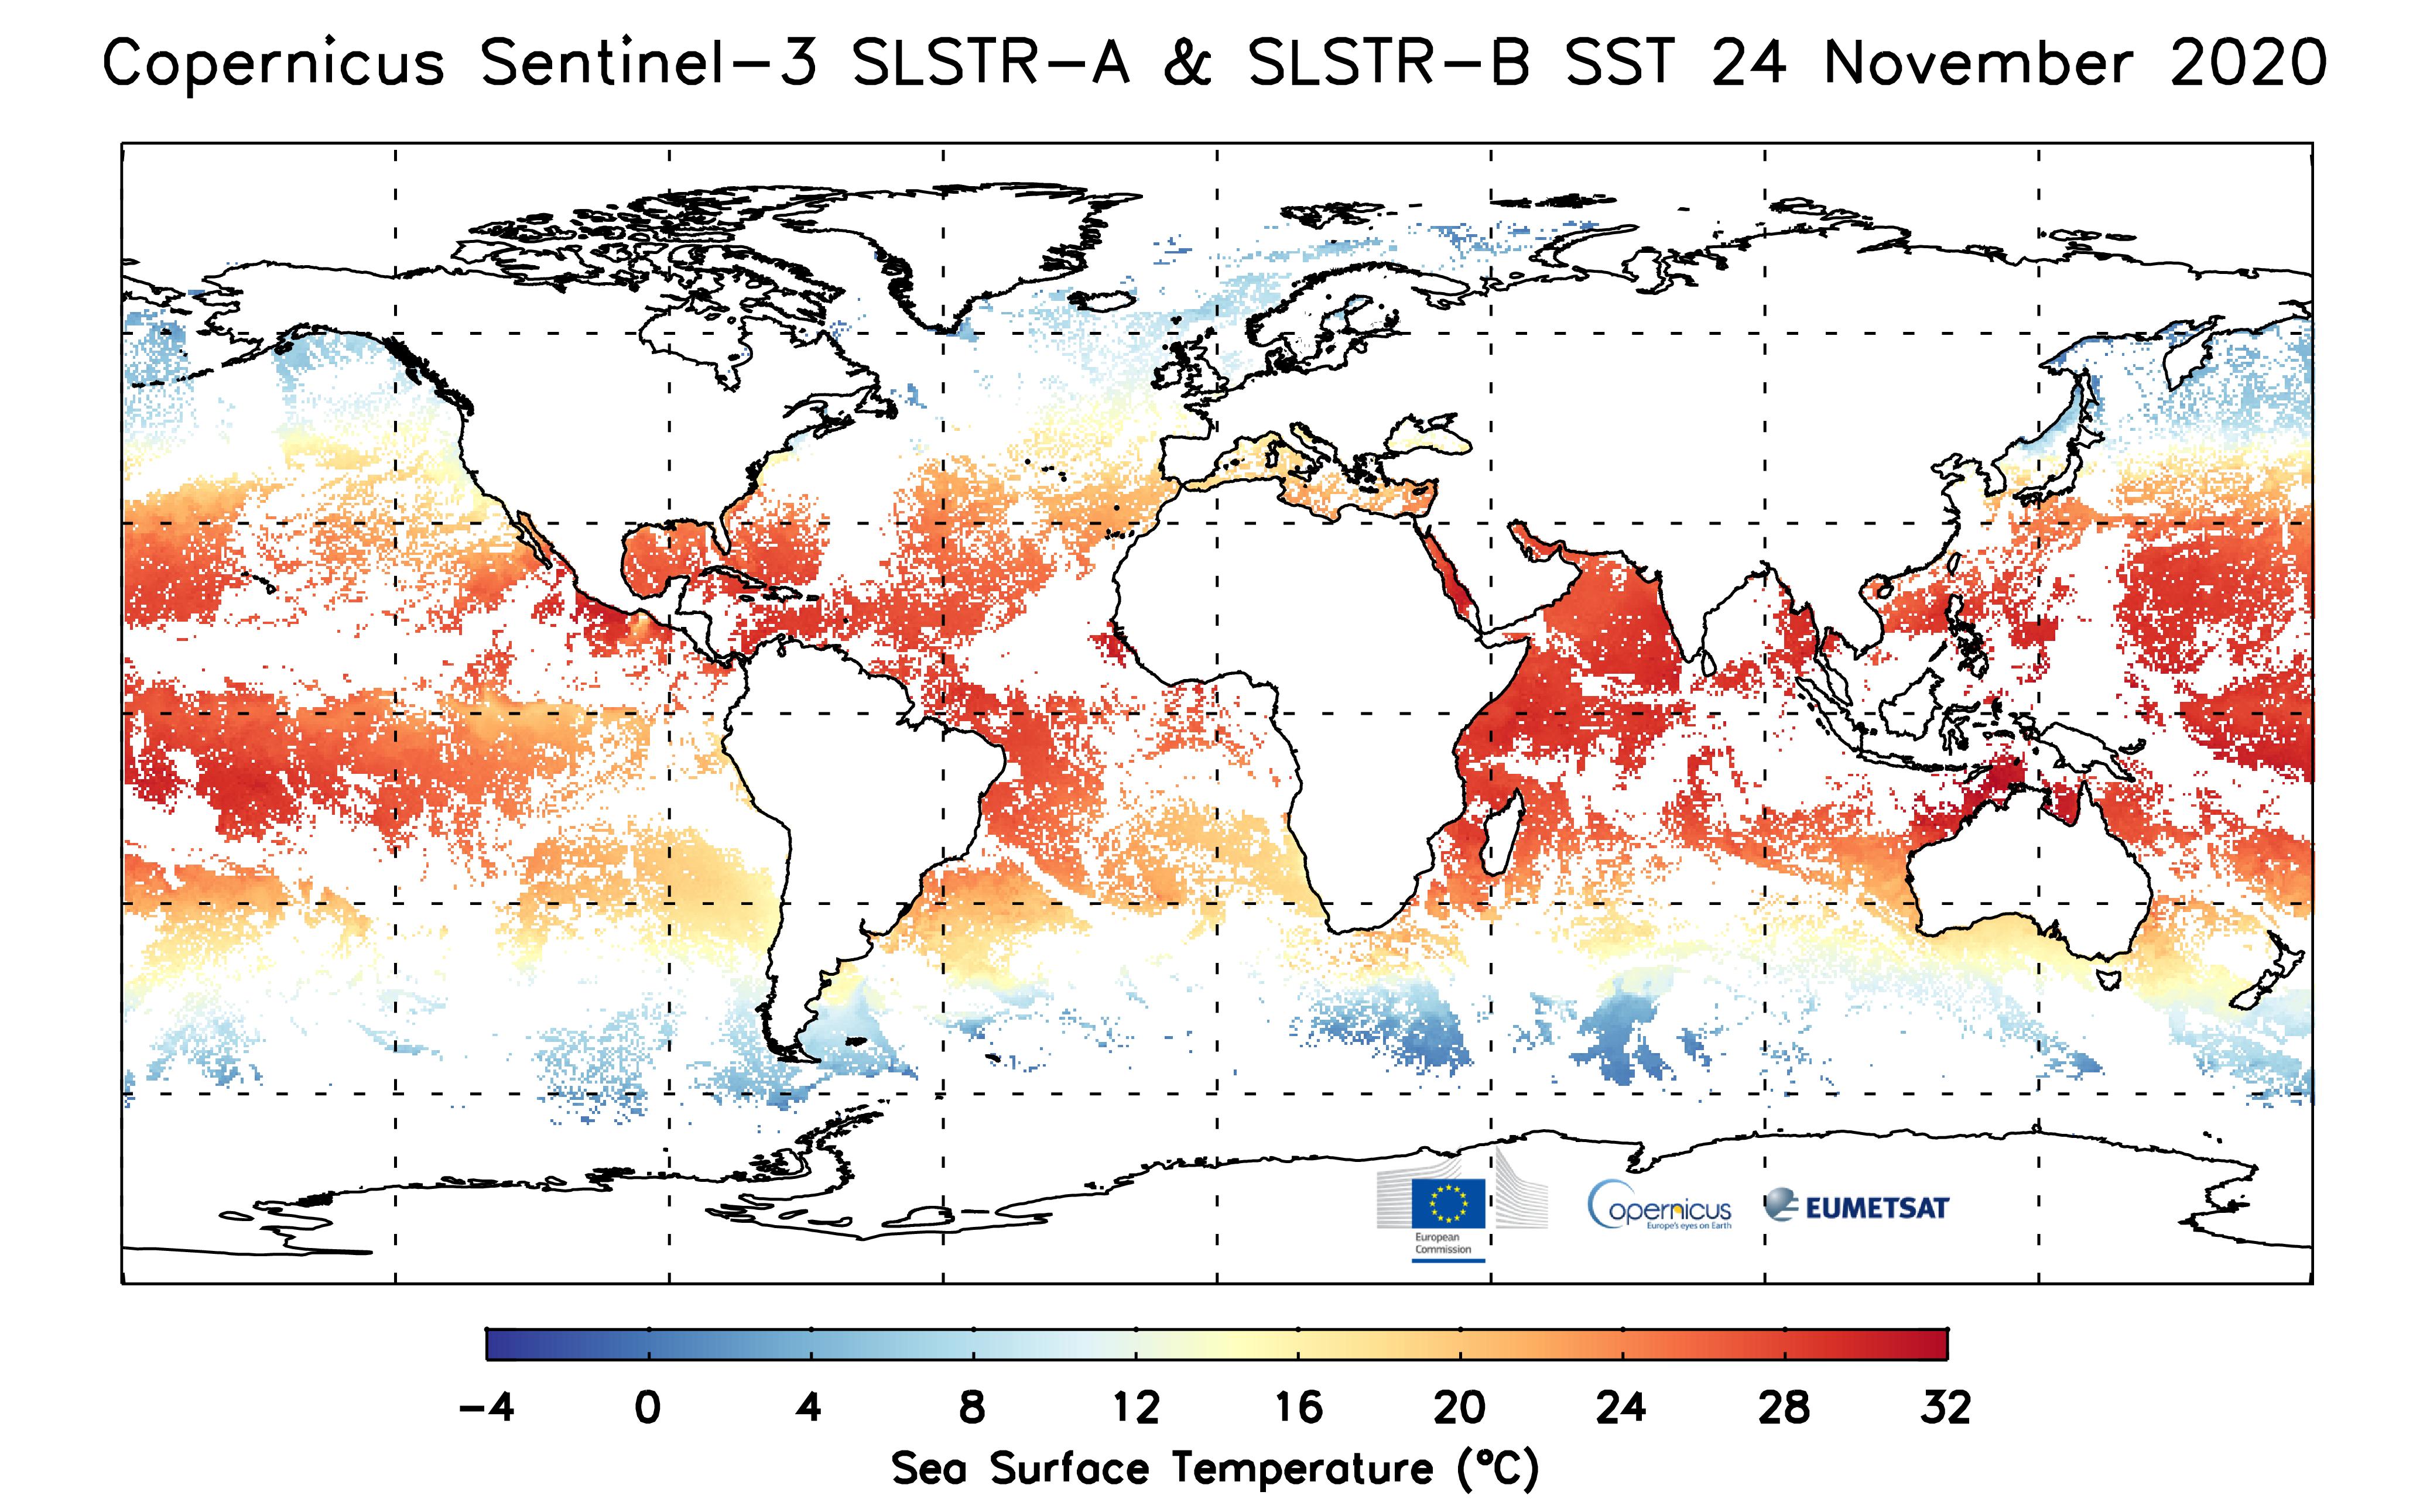 Daily averaged SST from both SLSTR-A and SLSTR-B for 24 November 2020